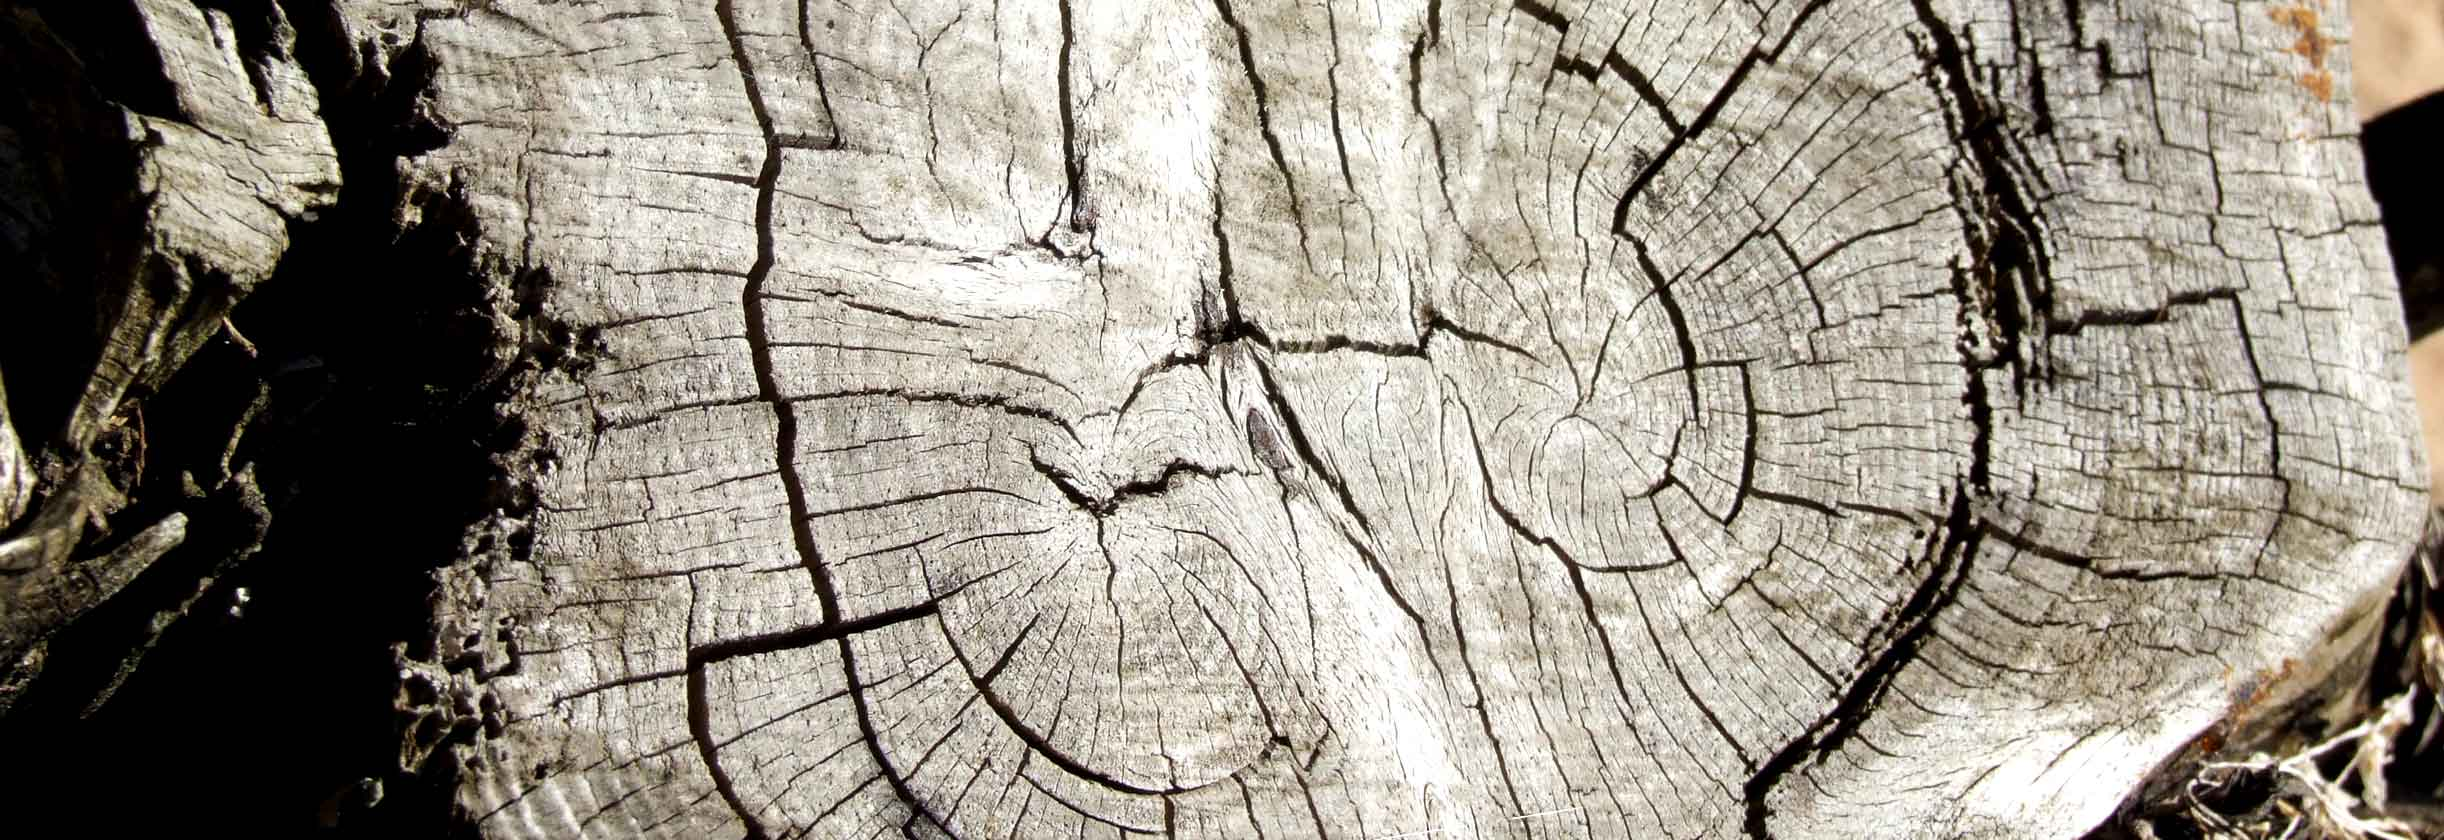 Woodworking Company wood4home